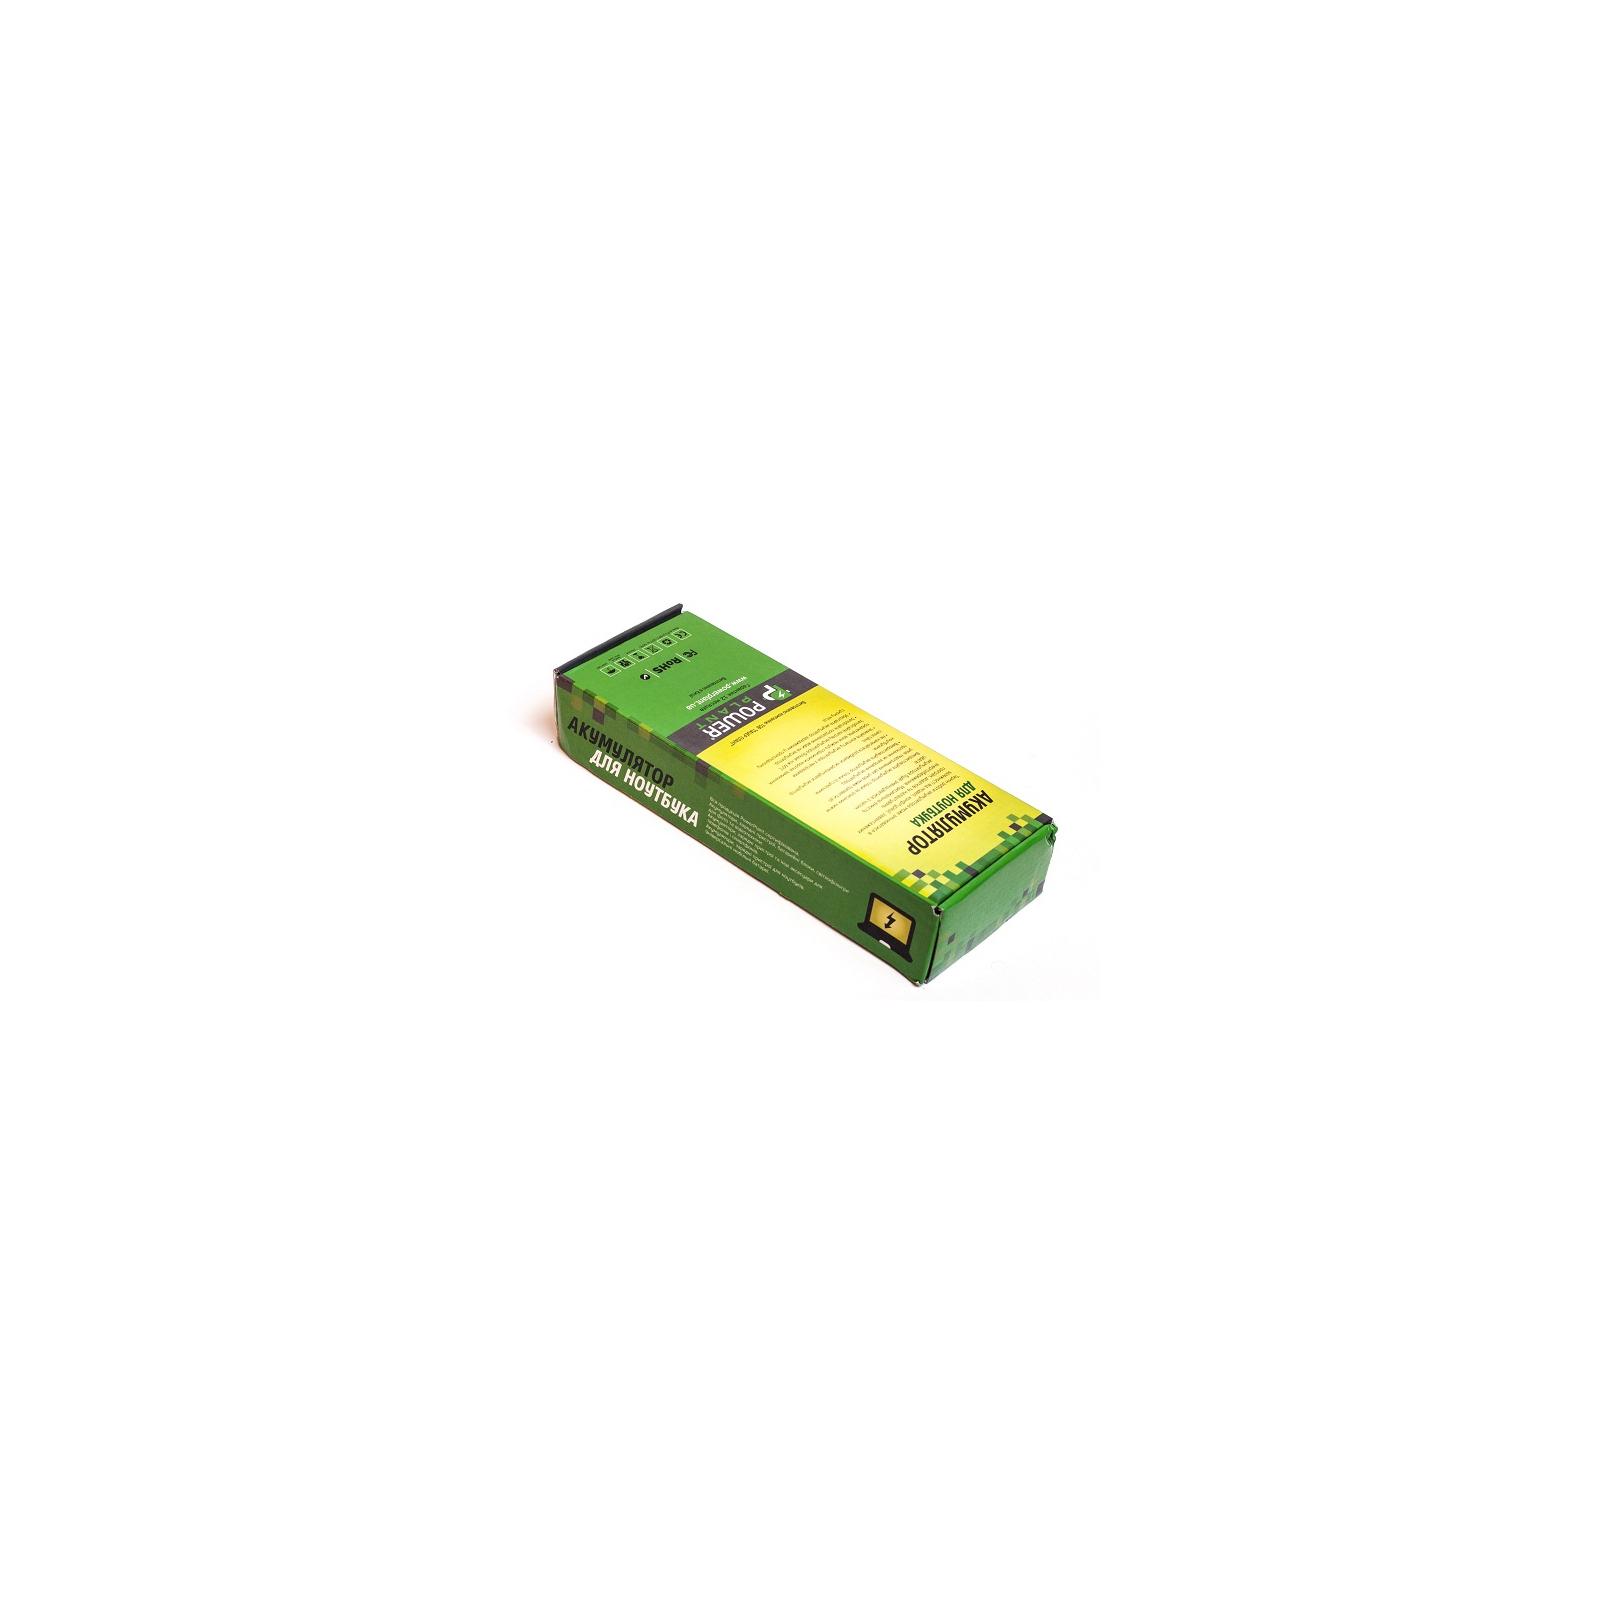 Аккумулятор для ноутбука LENOVO ThinkPad SL410K (FRU42T4795, IMSL40LH) 10.8V 5200mAh PowerPlant (NB00000069) изображение 2